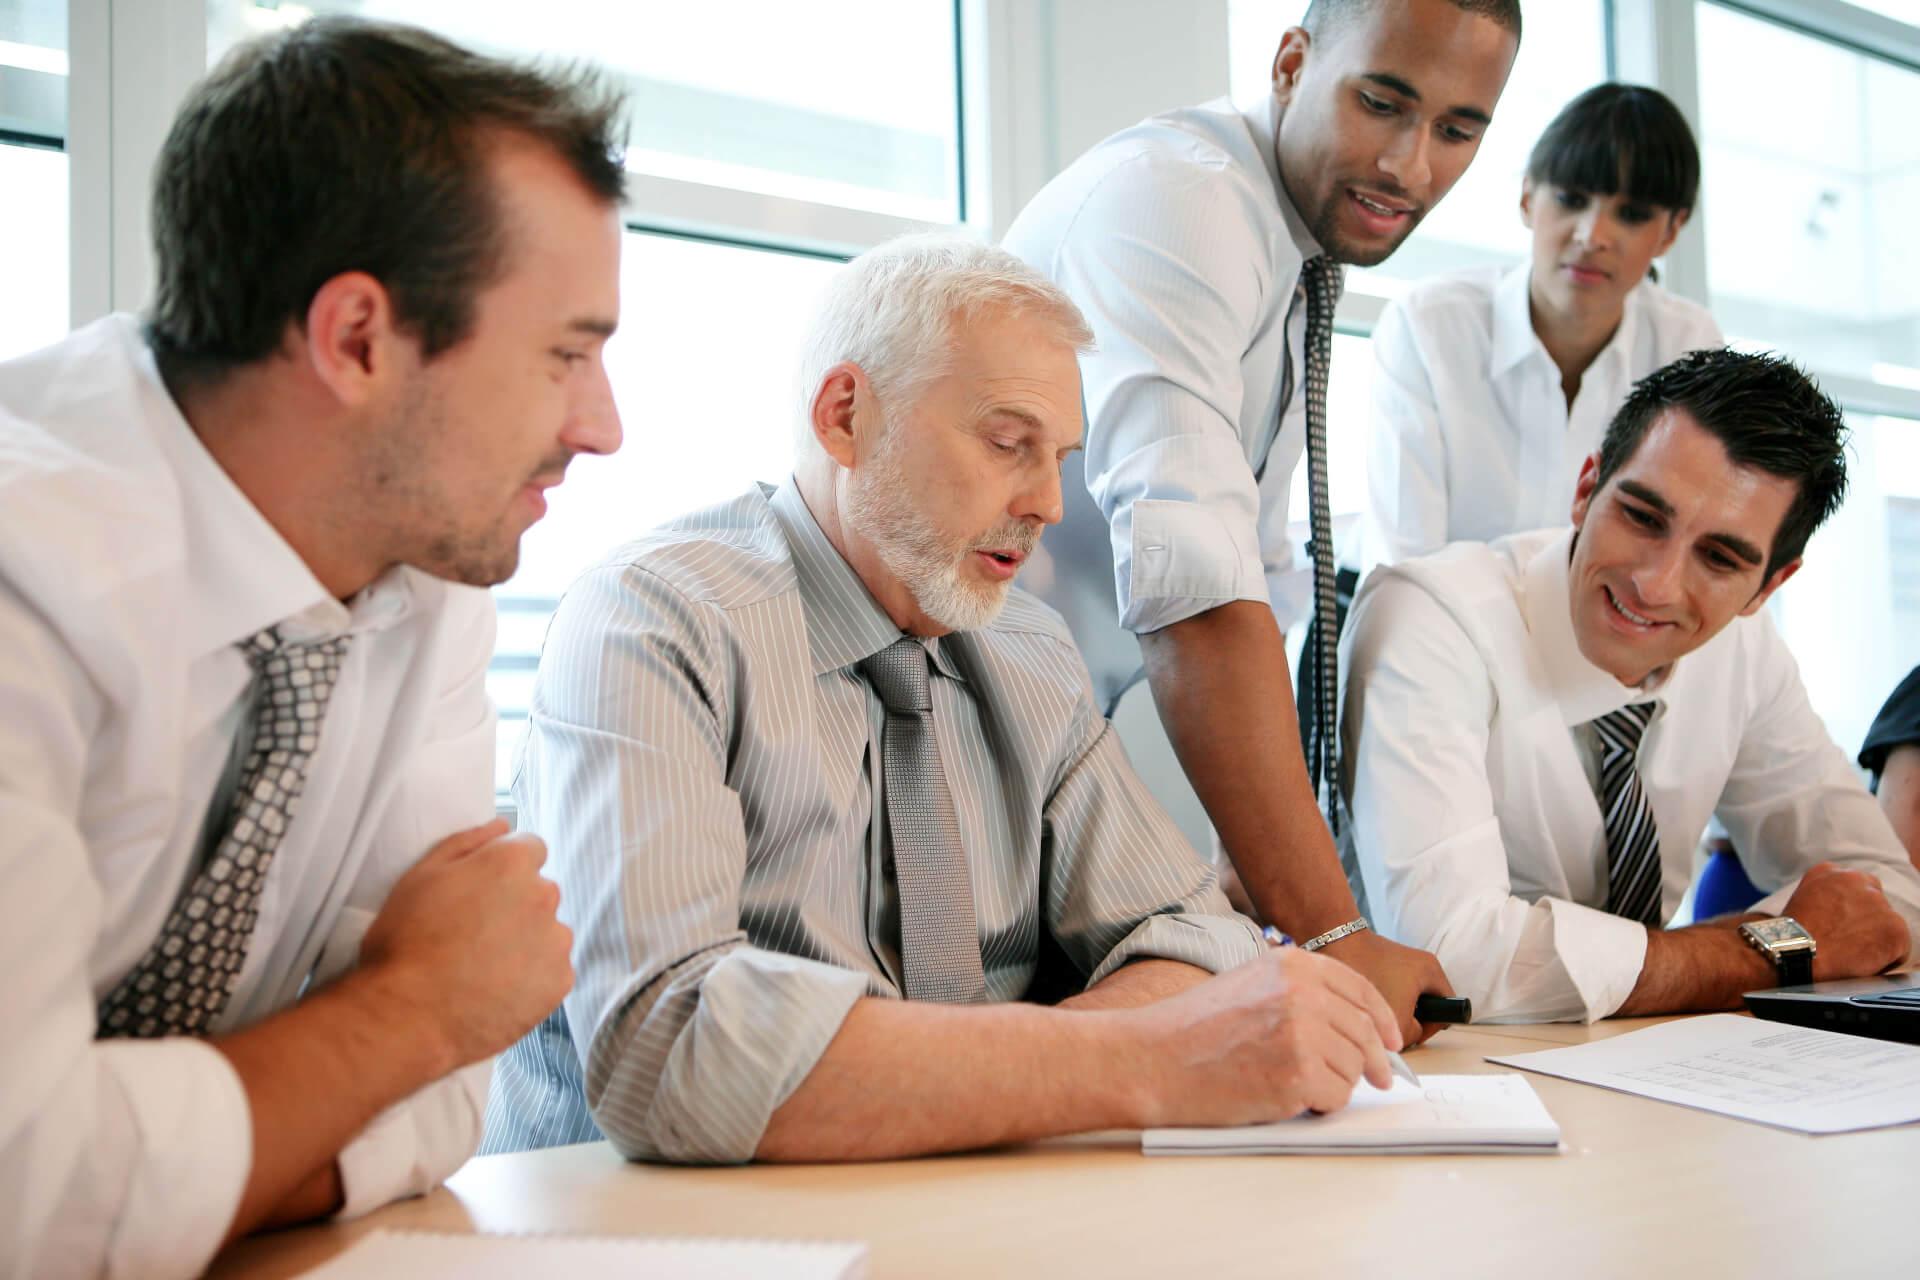 People in office having a meeting